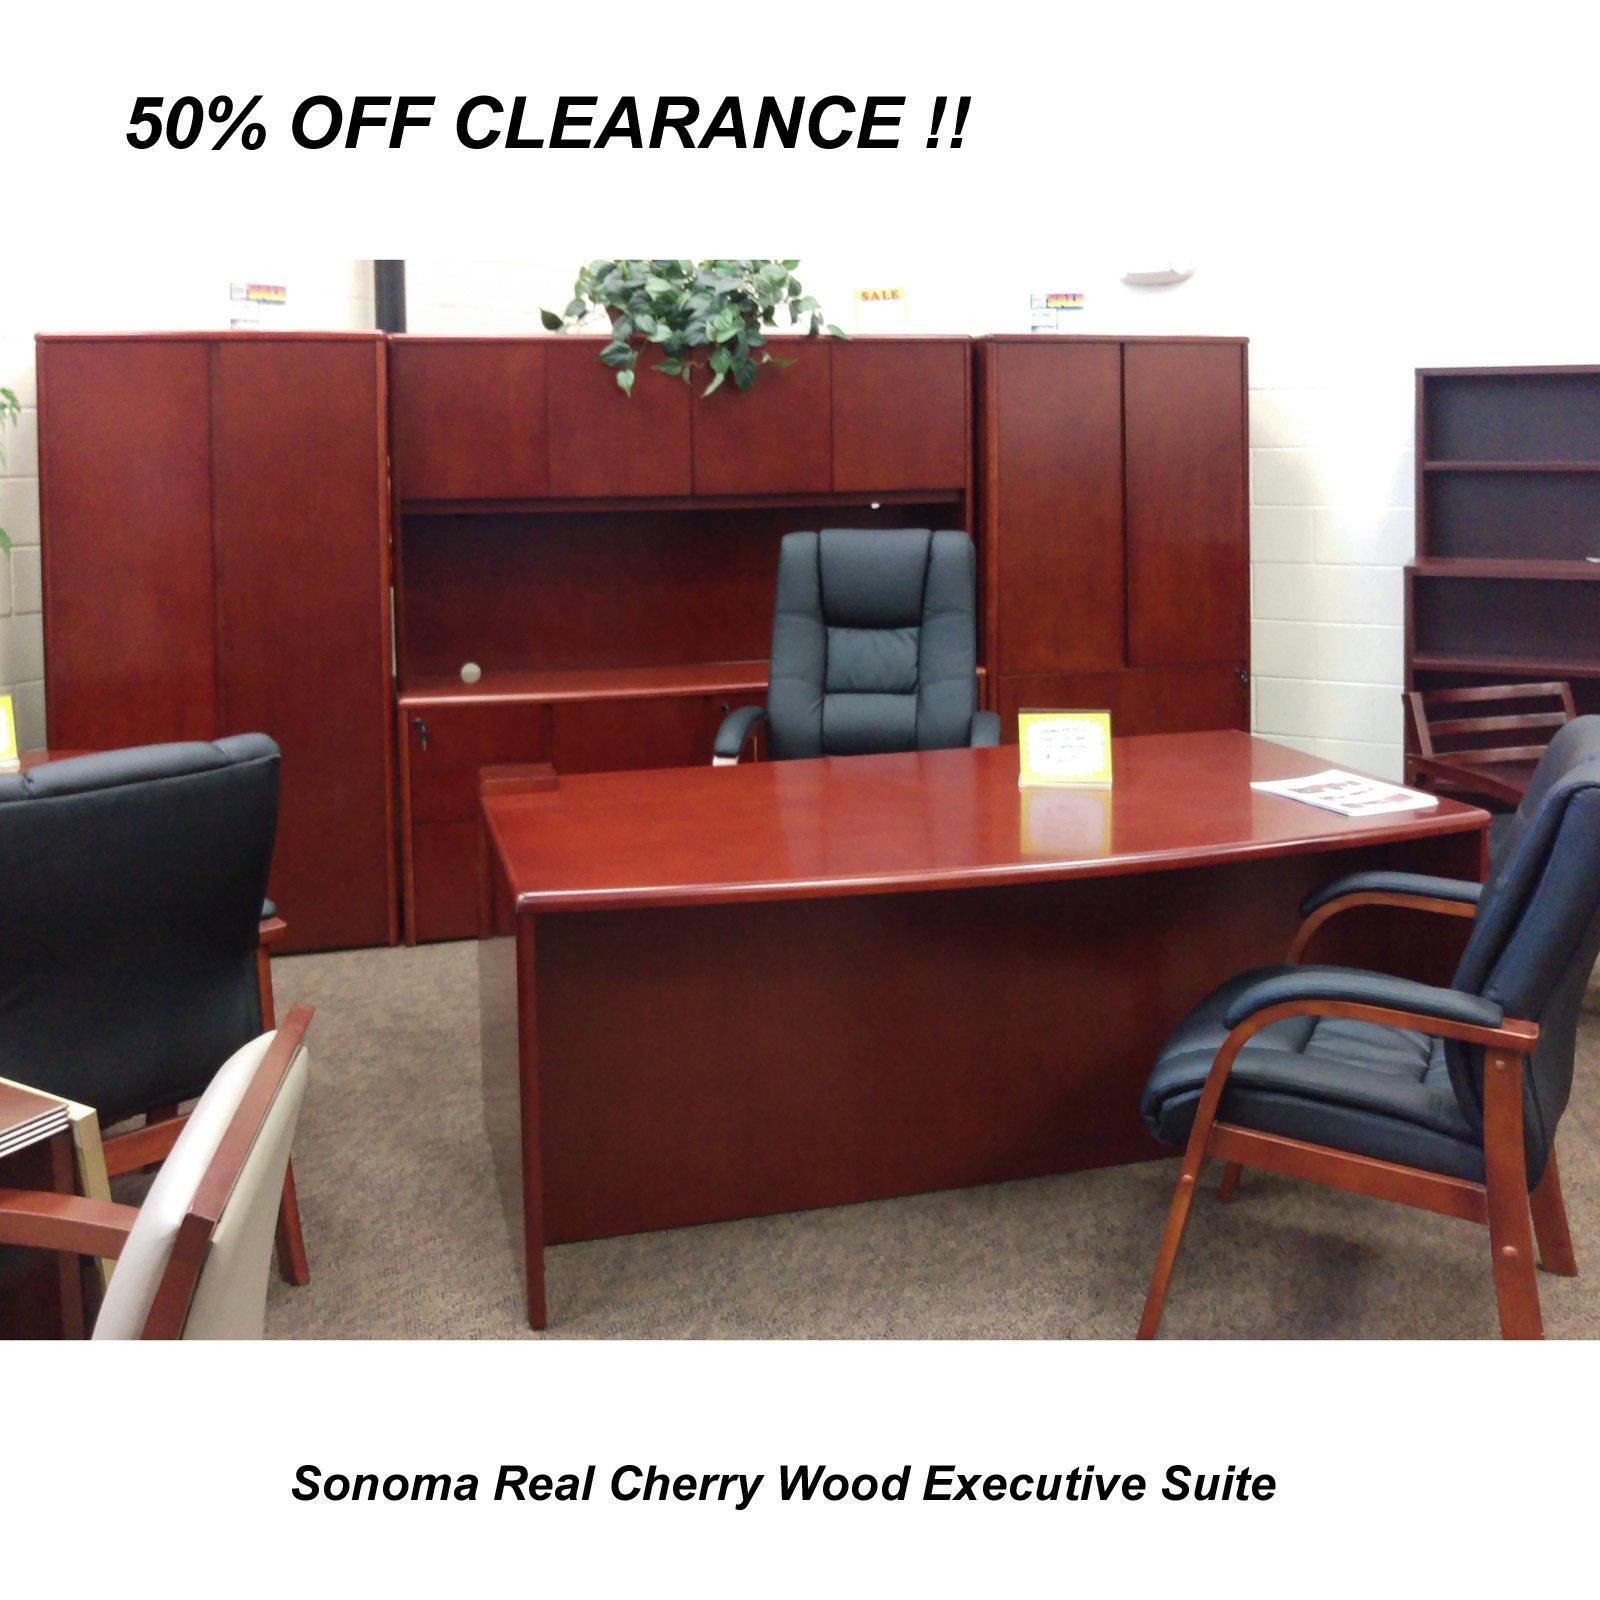 Executive office suite furniture - Executive Office Desk Suite In Dark Cherry Wood